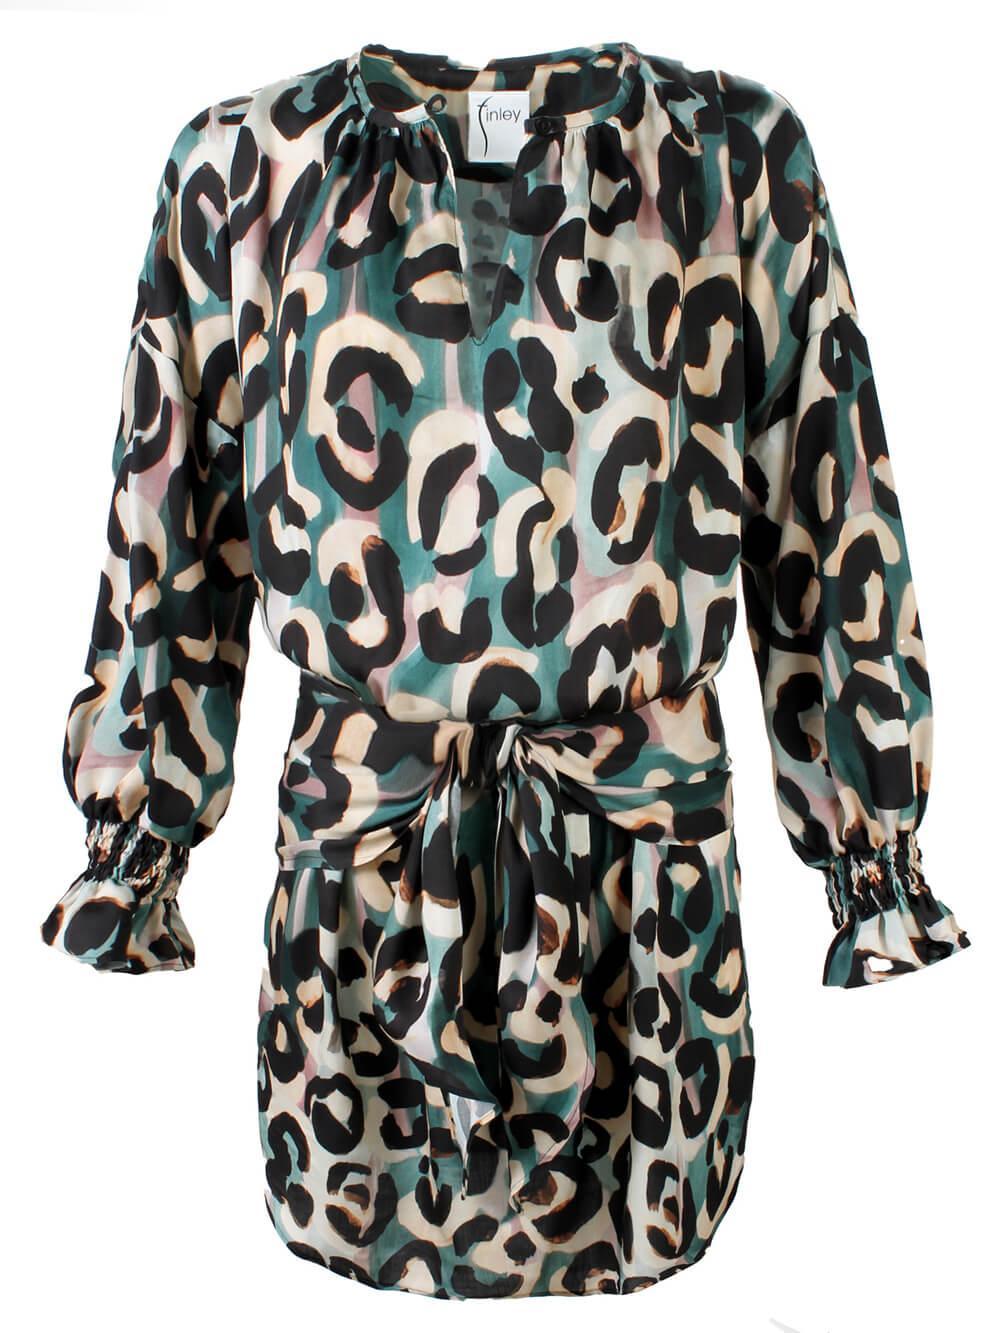 Mazy Abstract Jungle Print Dress Item # 3276081J